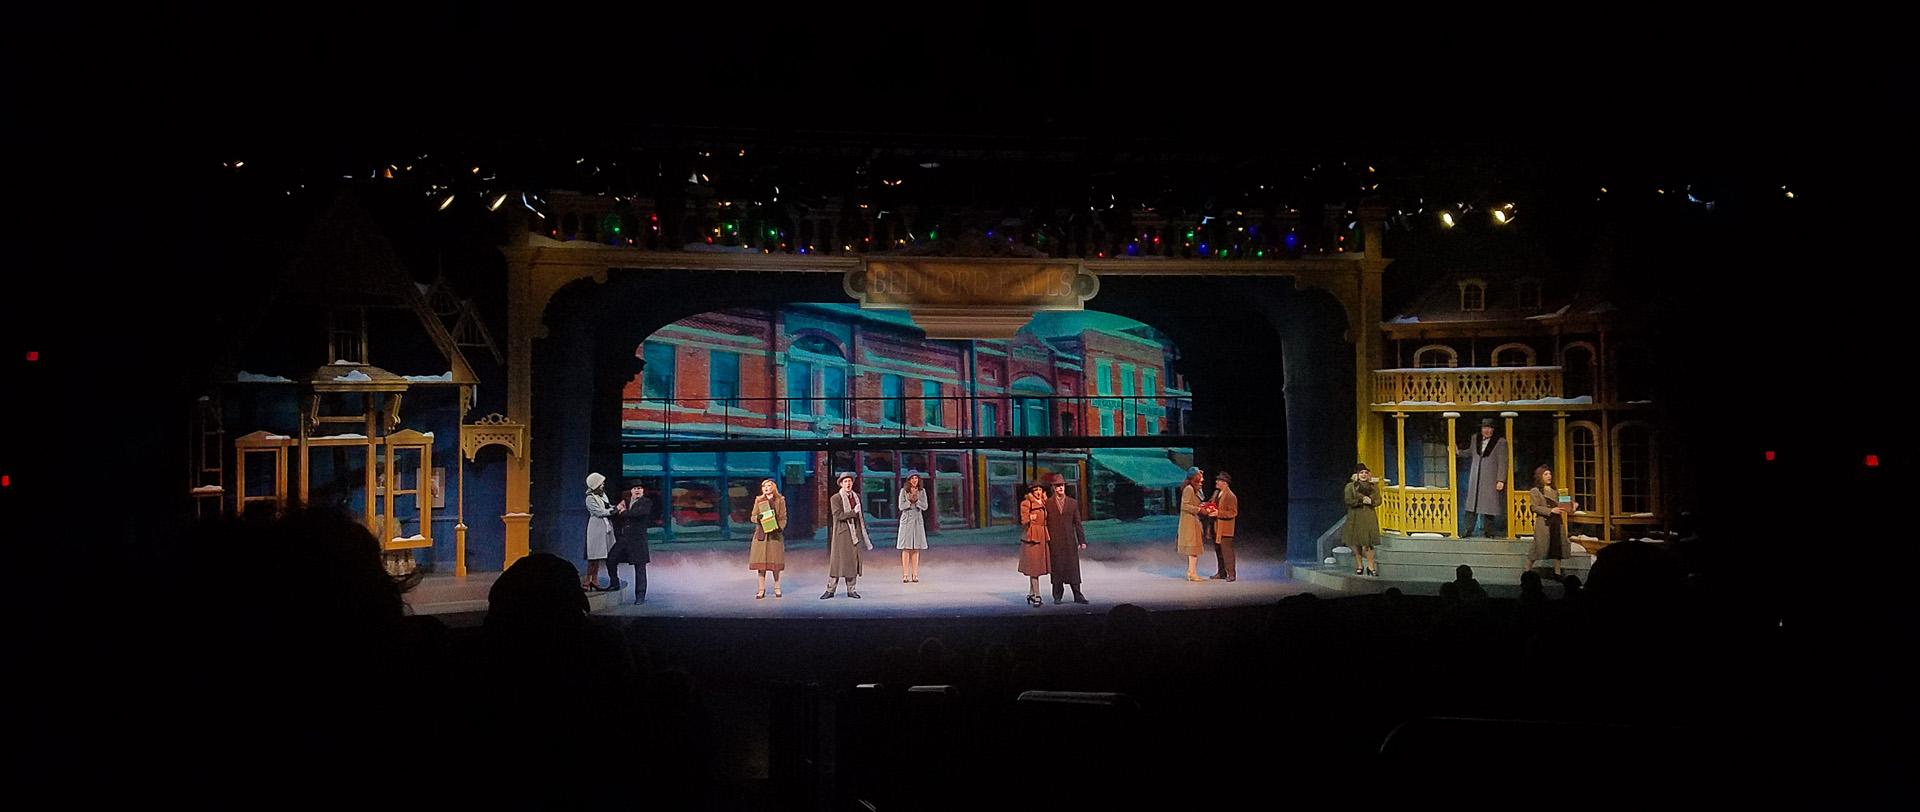 Silver Dollar City Branson MO theme park (5).jpg